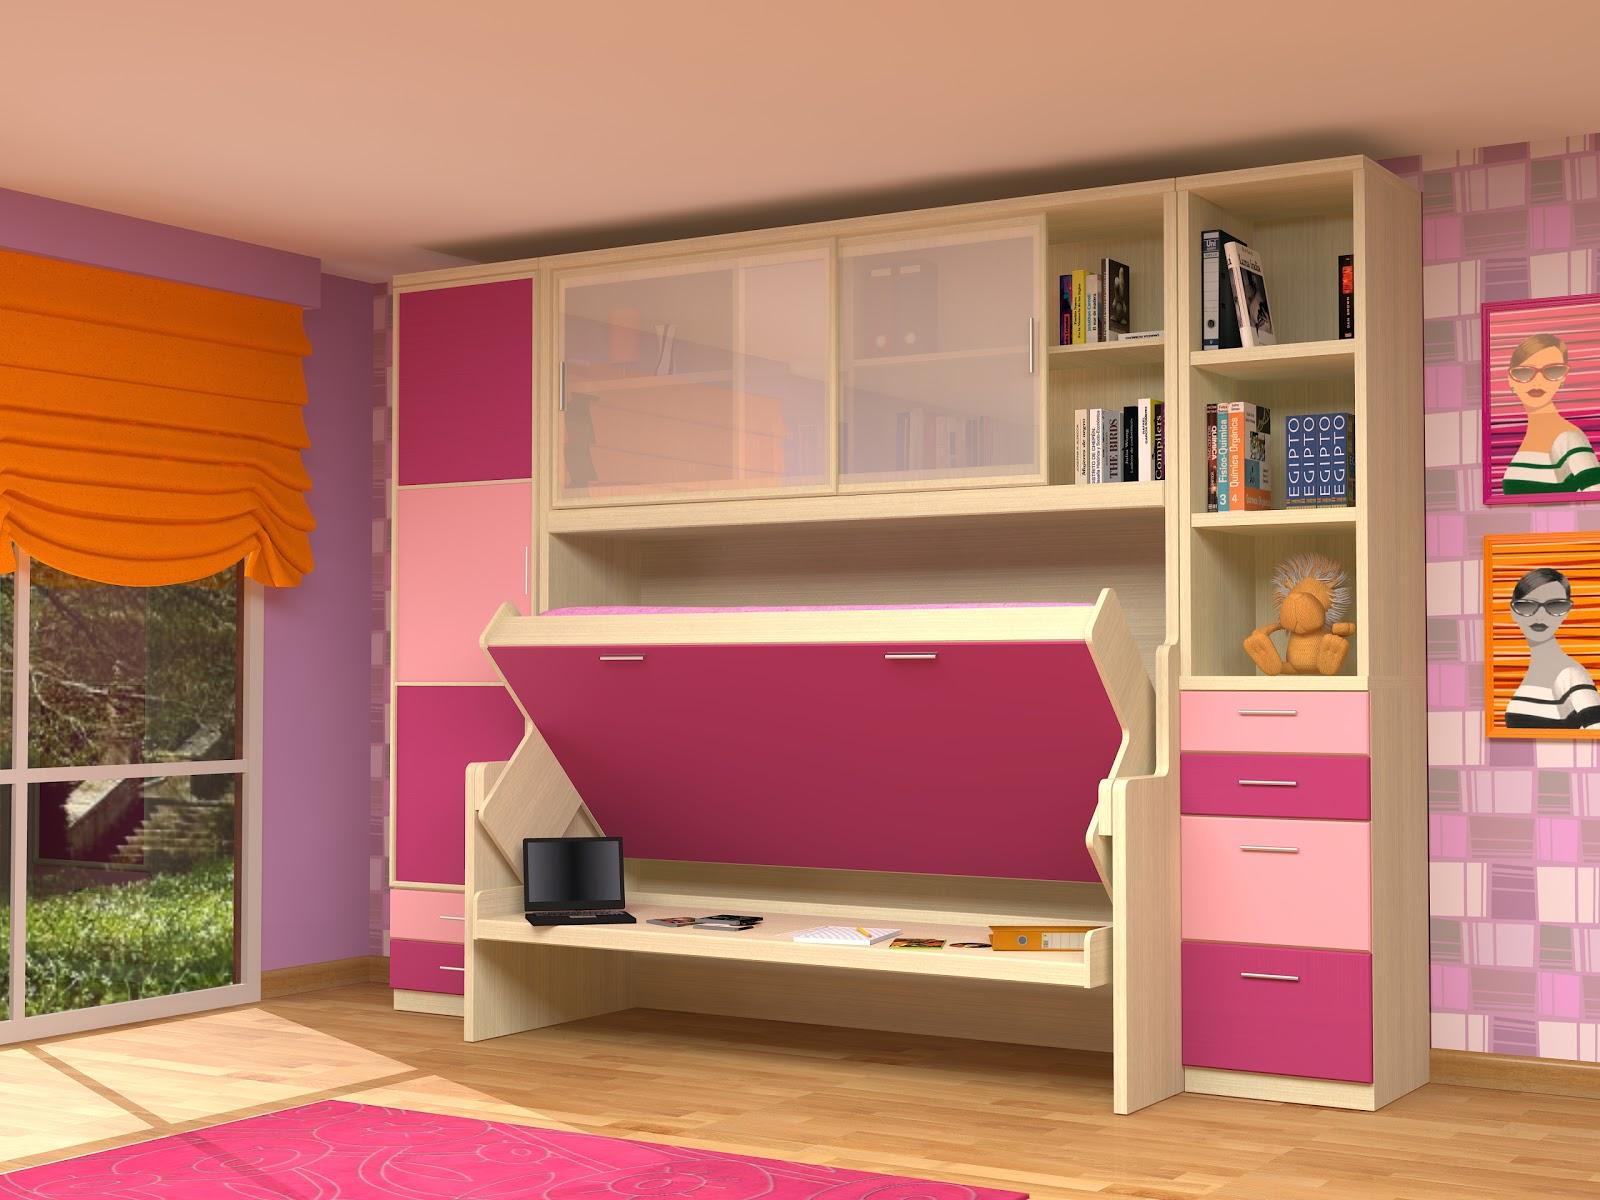 Cama mesa abatible camas autoportantes cama escritorio for Muebles de pared